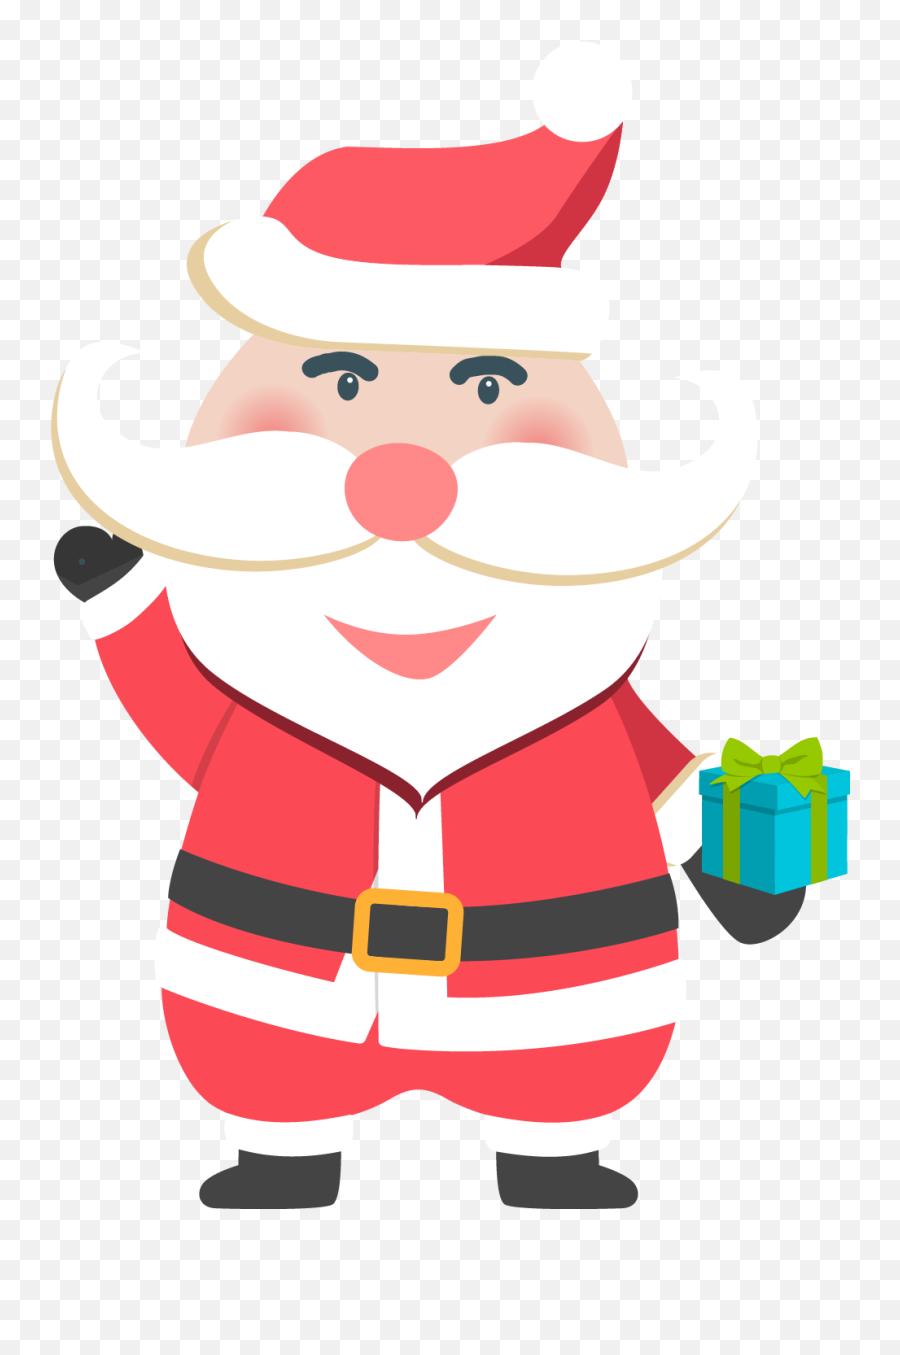 Free Transparent Santa Claus Download - Christmas Day Emoji,Santa Clause Emoticon